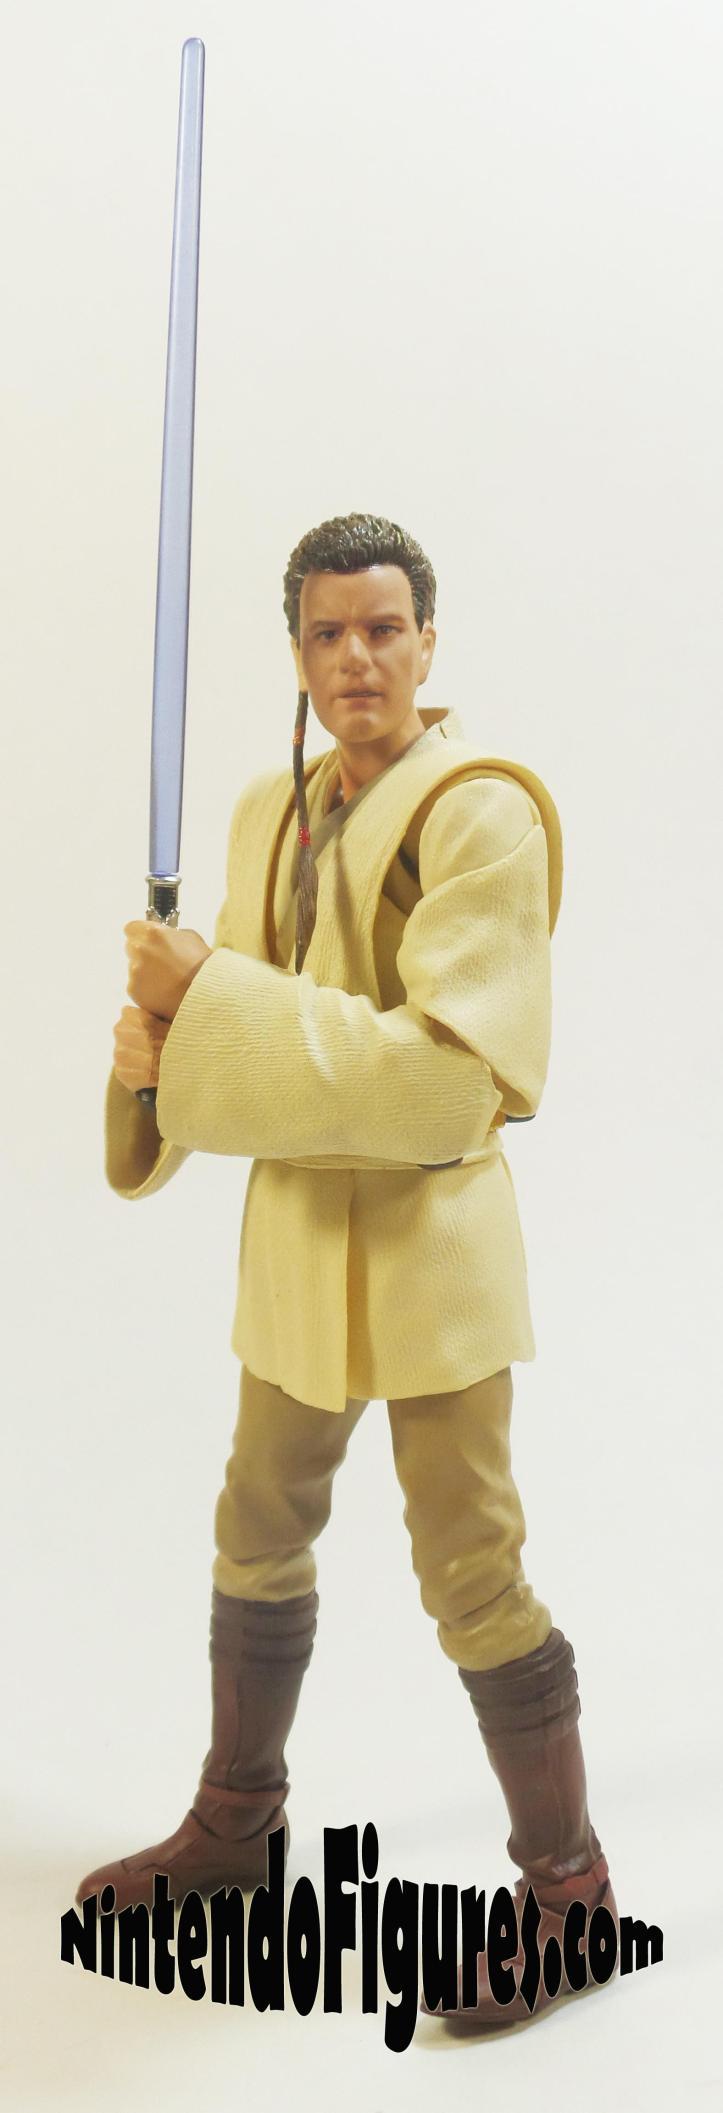 S.H. Figuarts Star Wars Obi-Wan Kenobi Bandai Pose 3